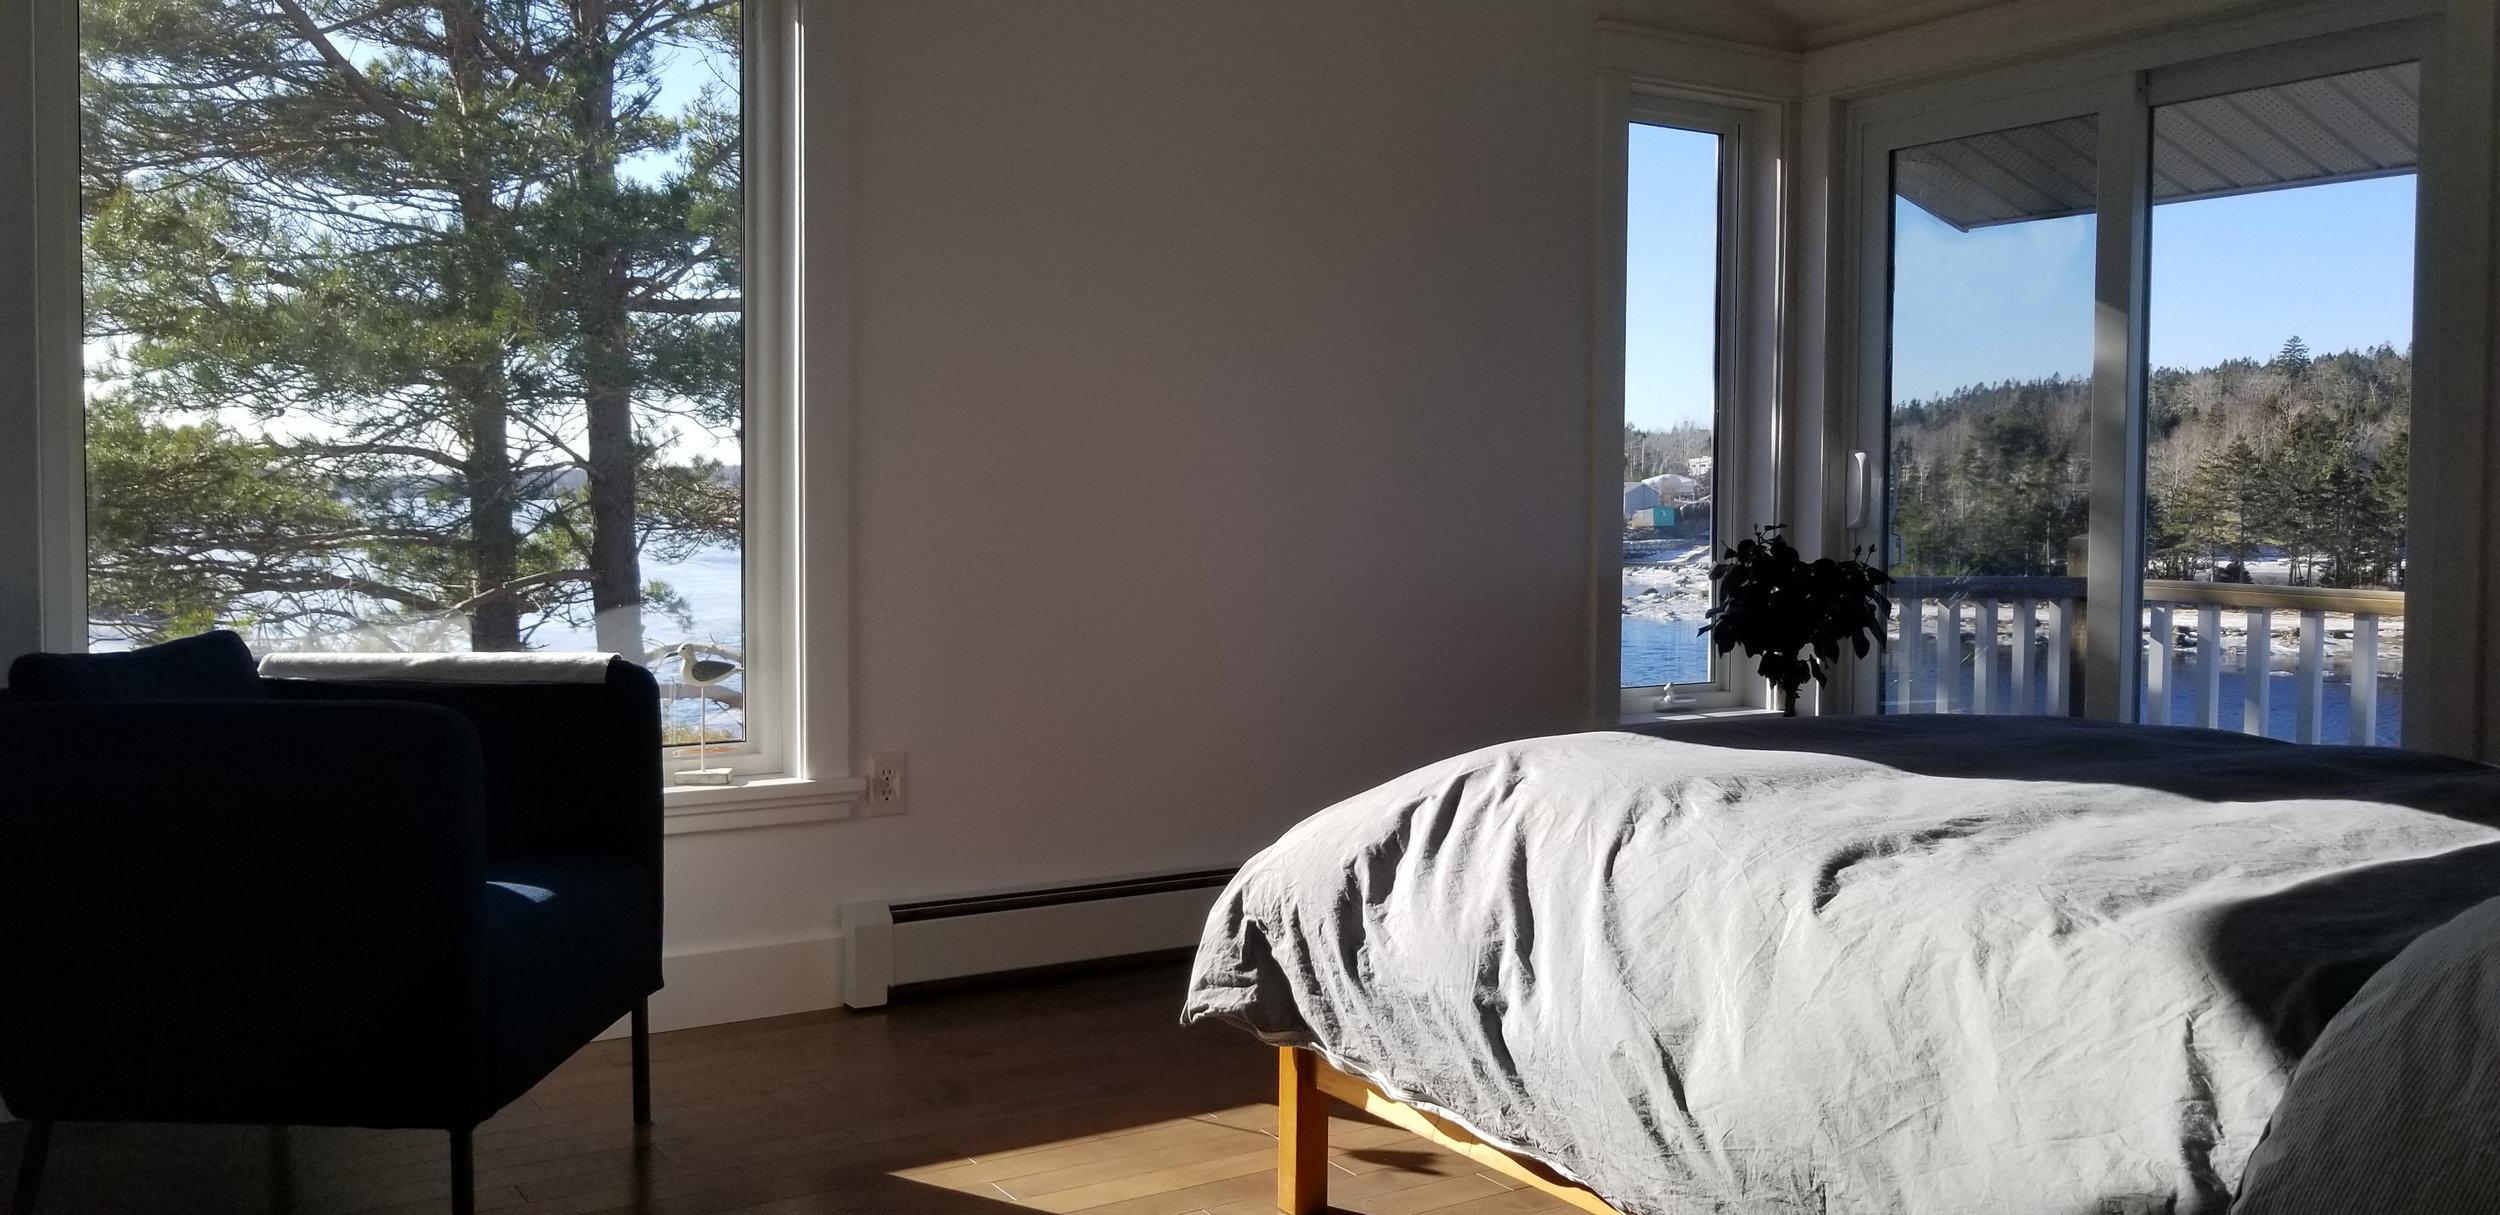 houdinidesign_ARCHITECTS_Bernier-Burton-Residence_Renovation_Bedroom_01.jpg